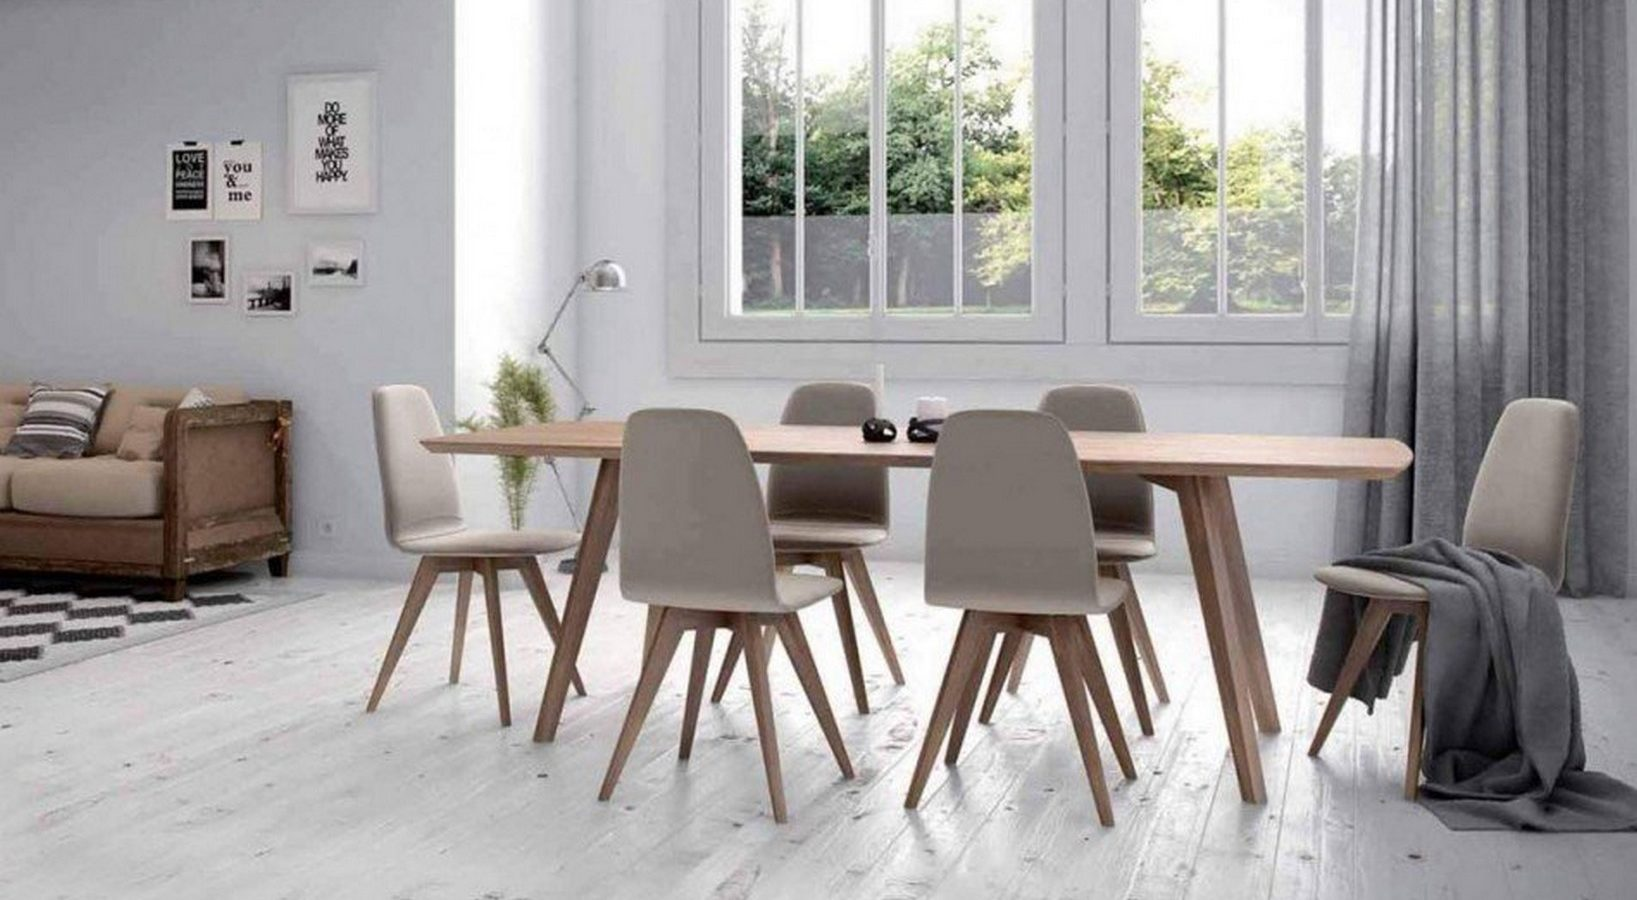 mobitec-mood-11-chaise-tissu-blanc-pied-chene-label-maison-nantes.